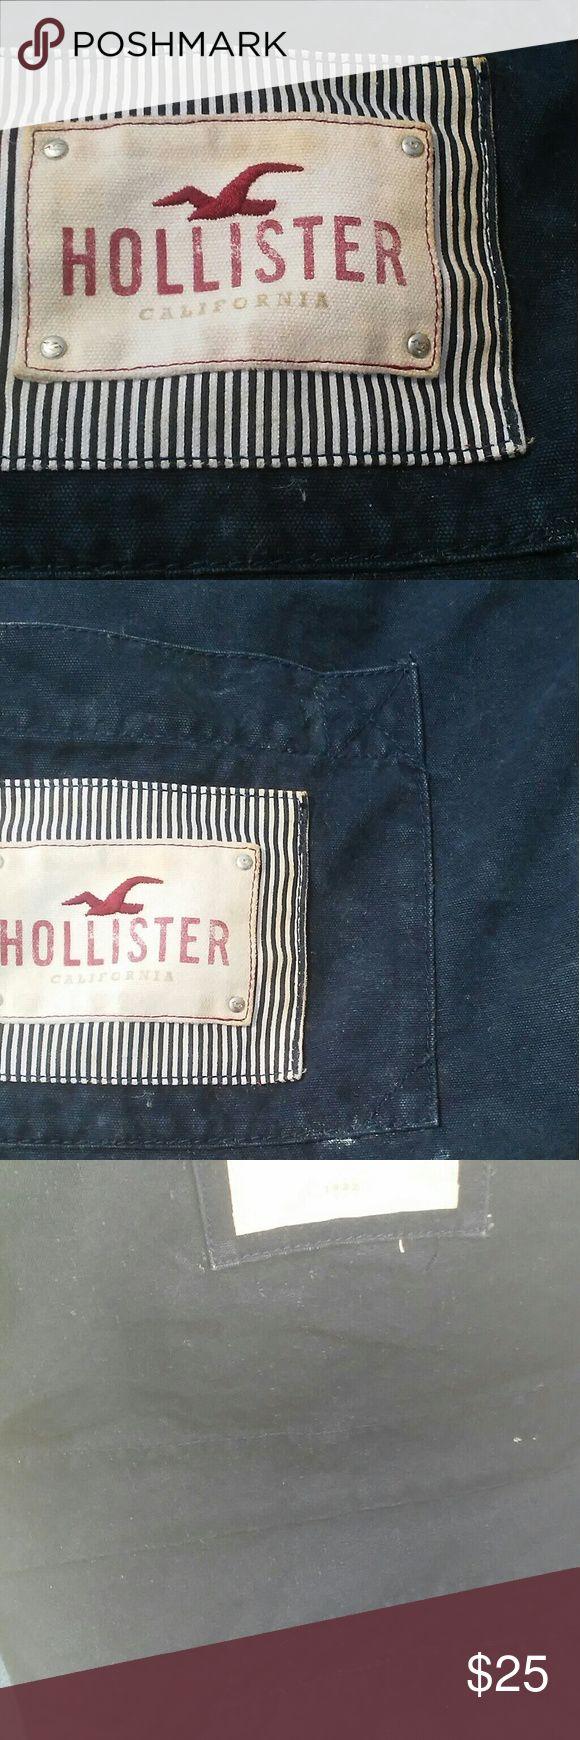 Hollister Tote Bag Large Navy Blue Canvas, durable a d convenient. Hollister Bags Totes